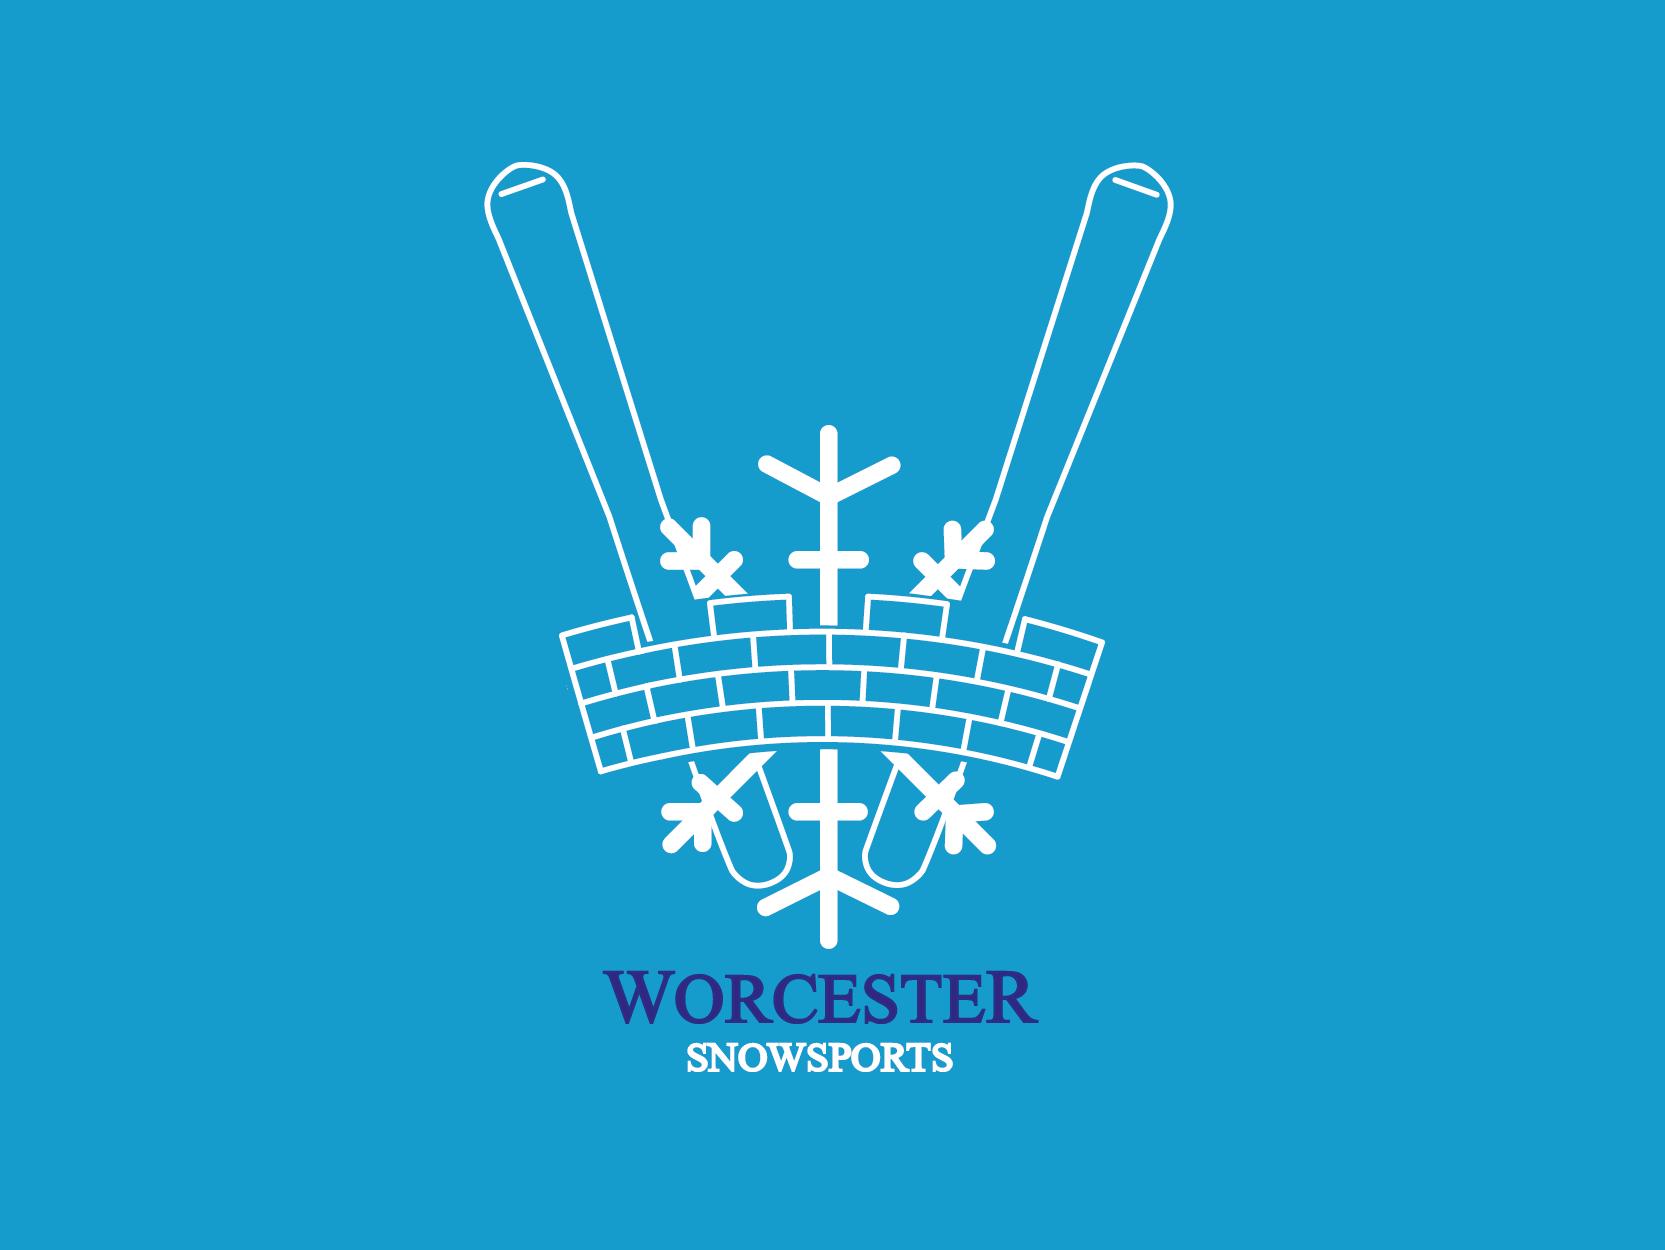 Worc_snowsports